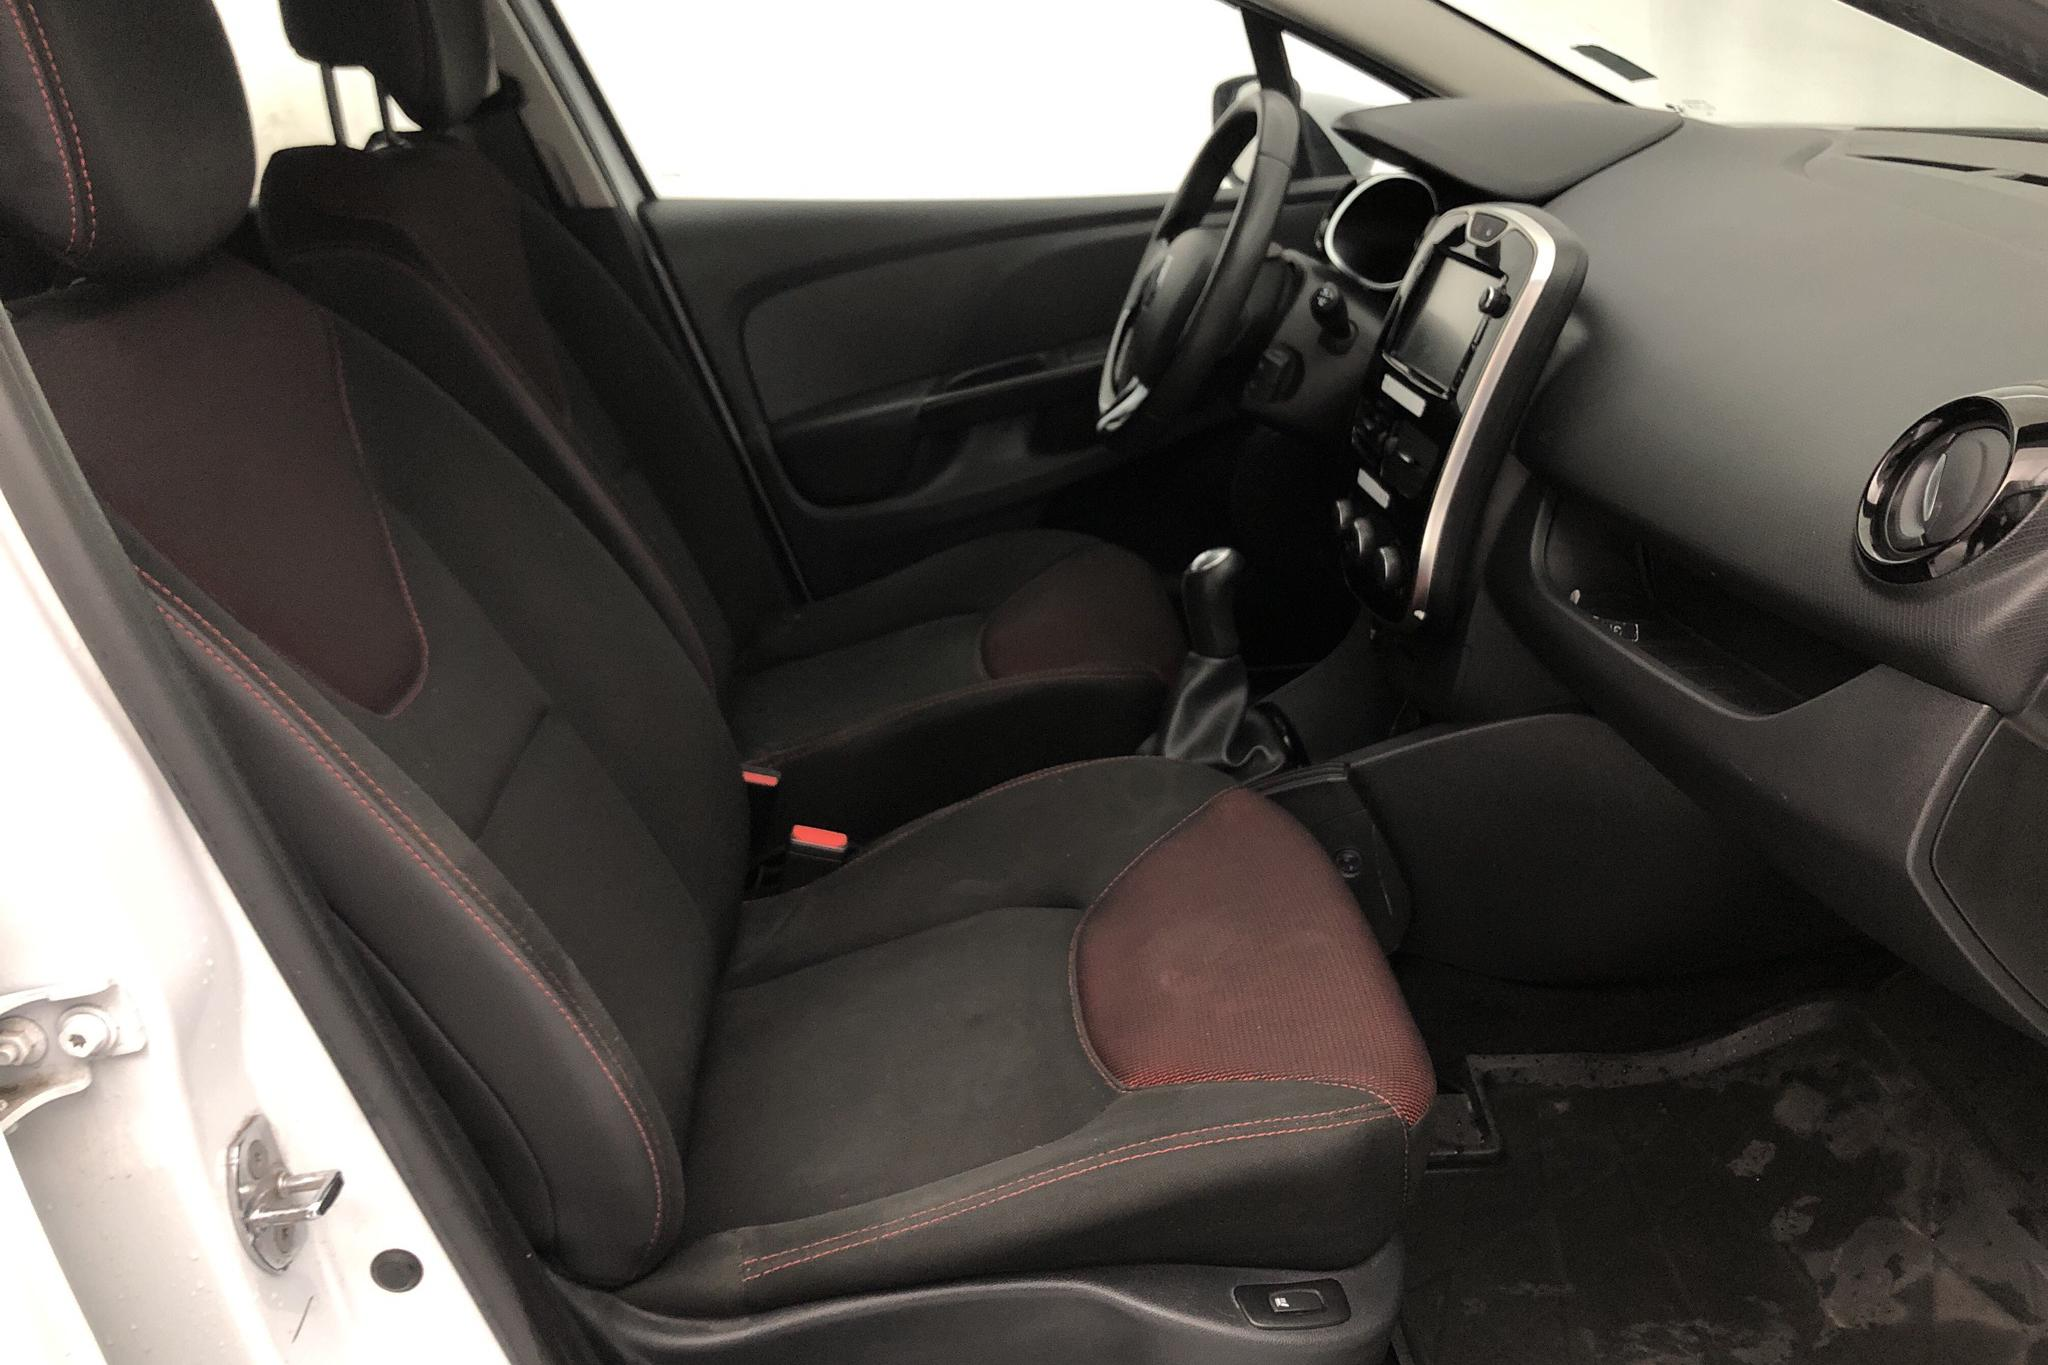 Renault Clio IV 1.5 dCi Sports Tourer (90hk) - 9 948 mil - Manuell - vit - 2016